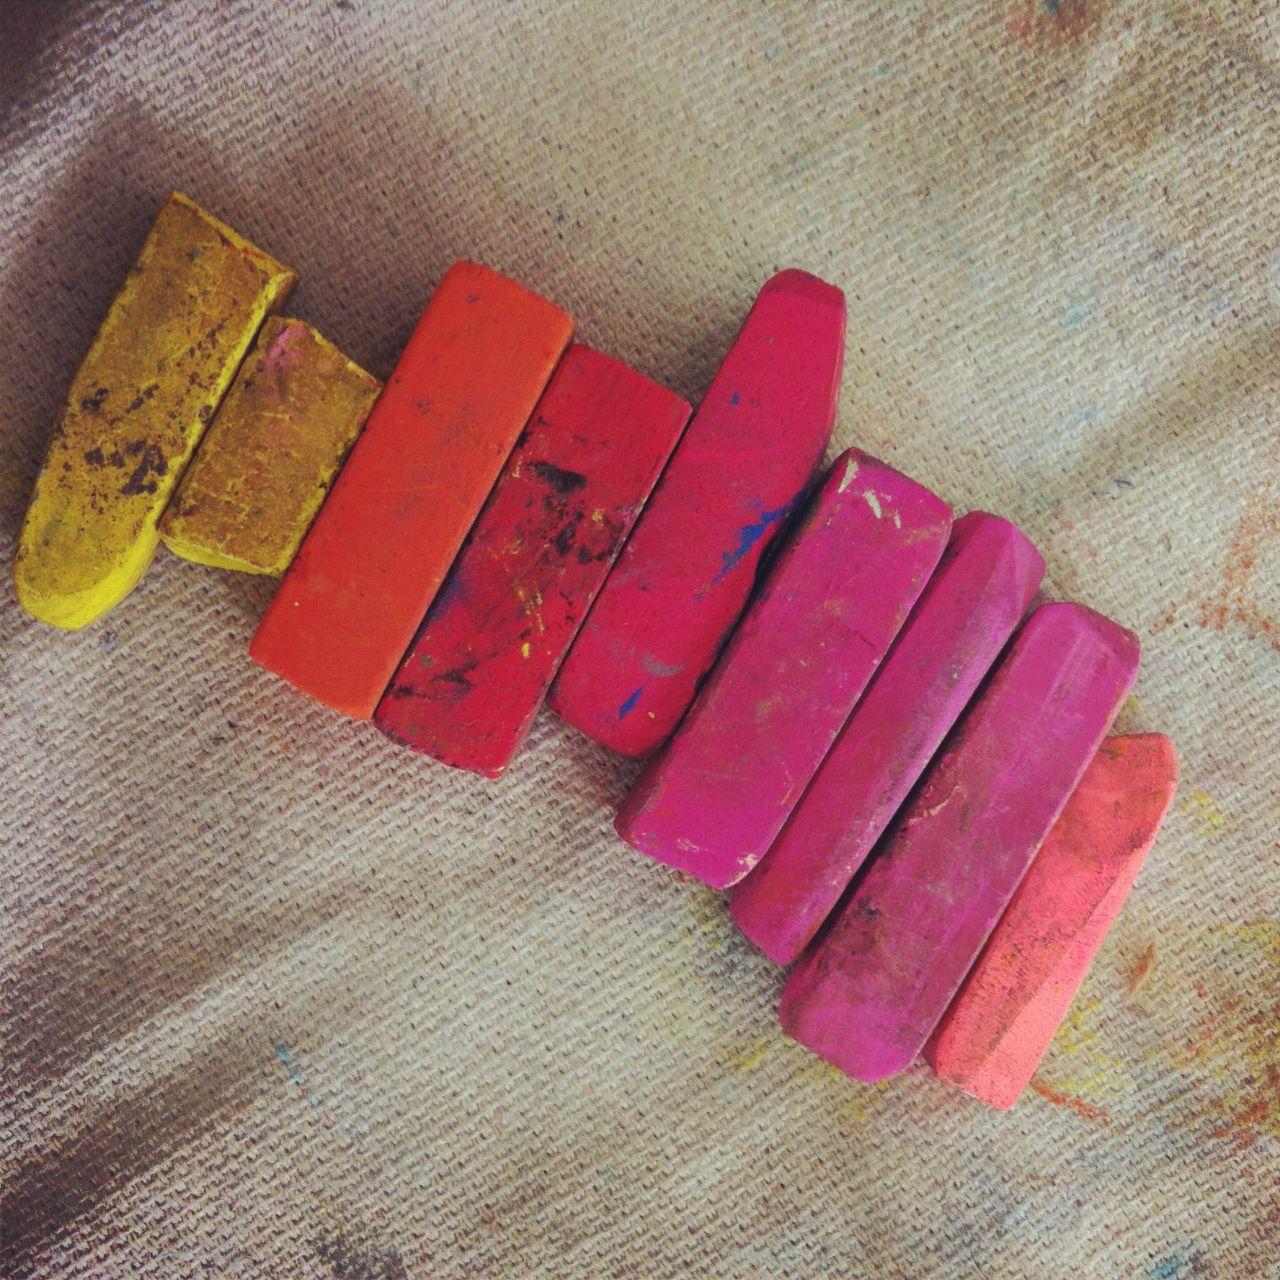 Just love soft pastels